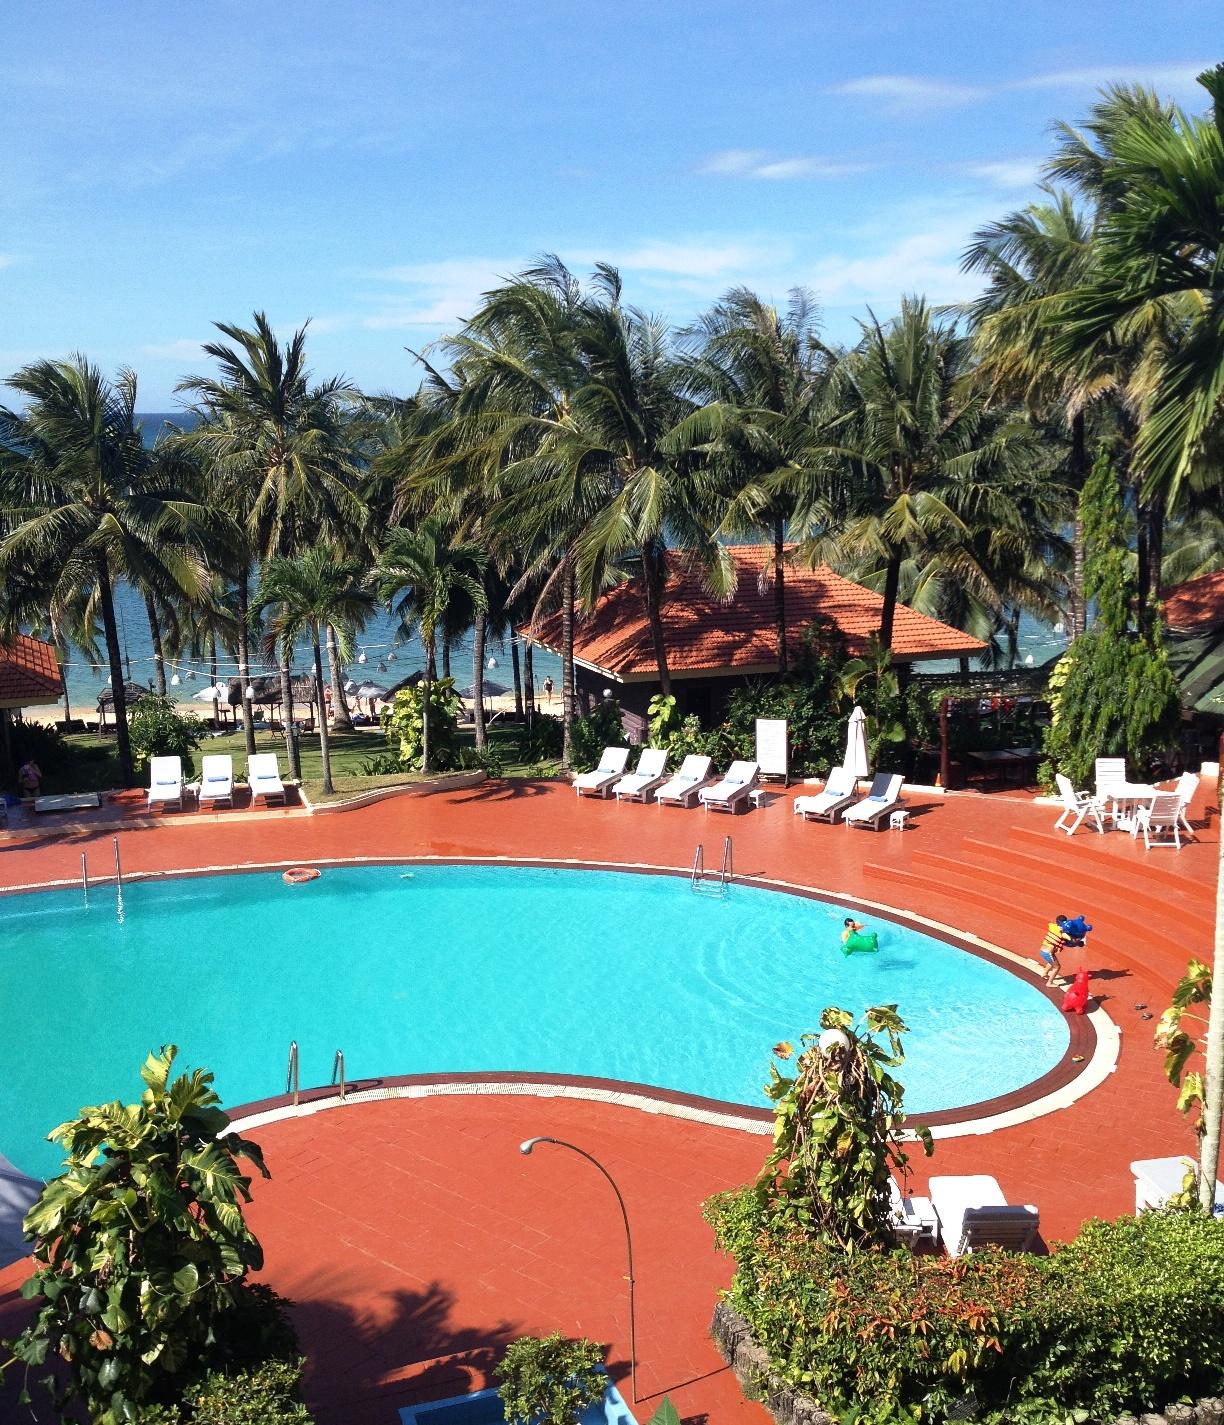 Saigon-Phu-Quoc-resort-vietnam-travelgrip- (2)